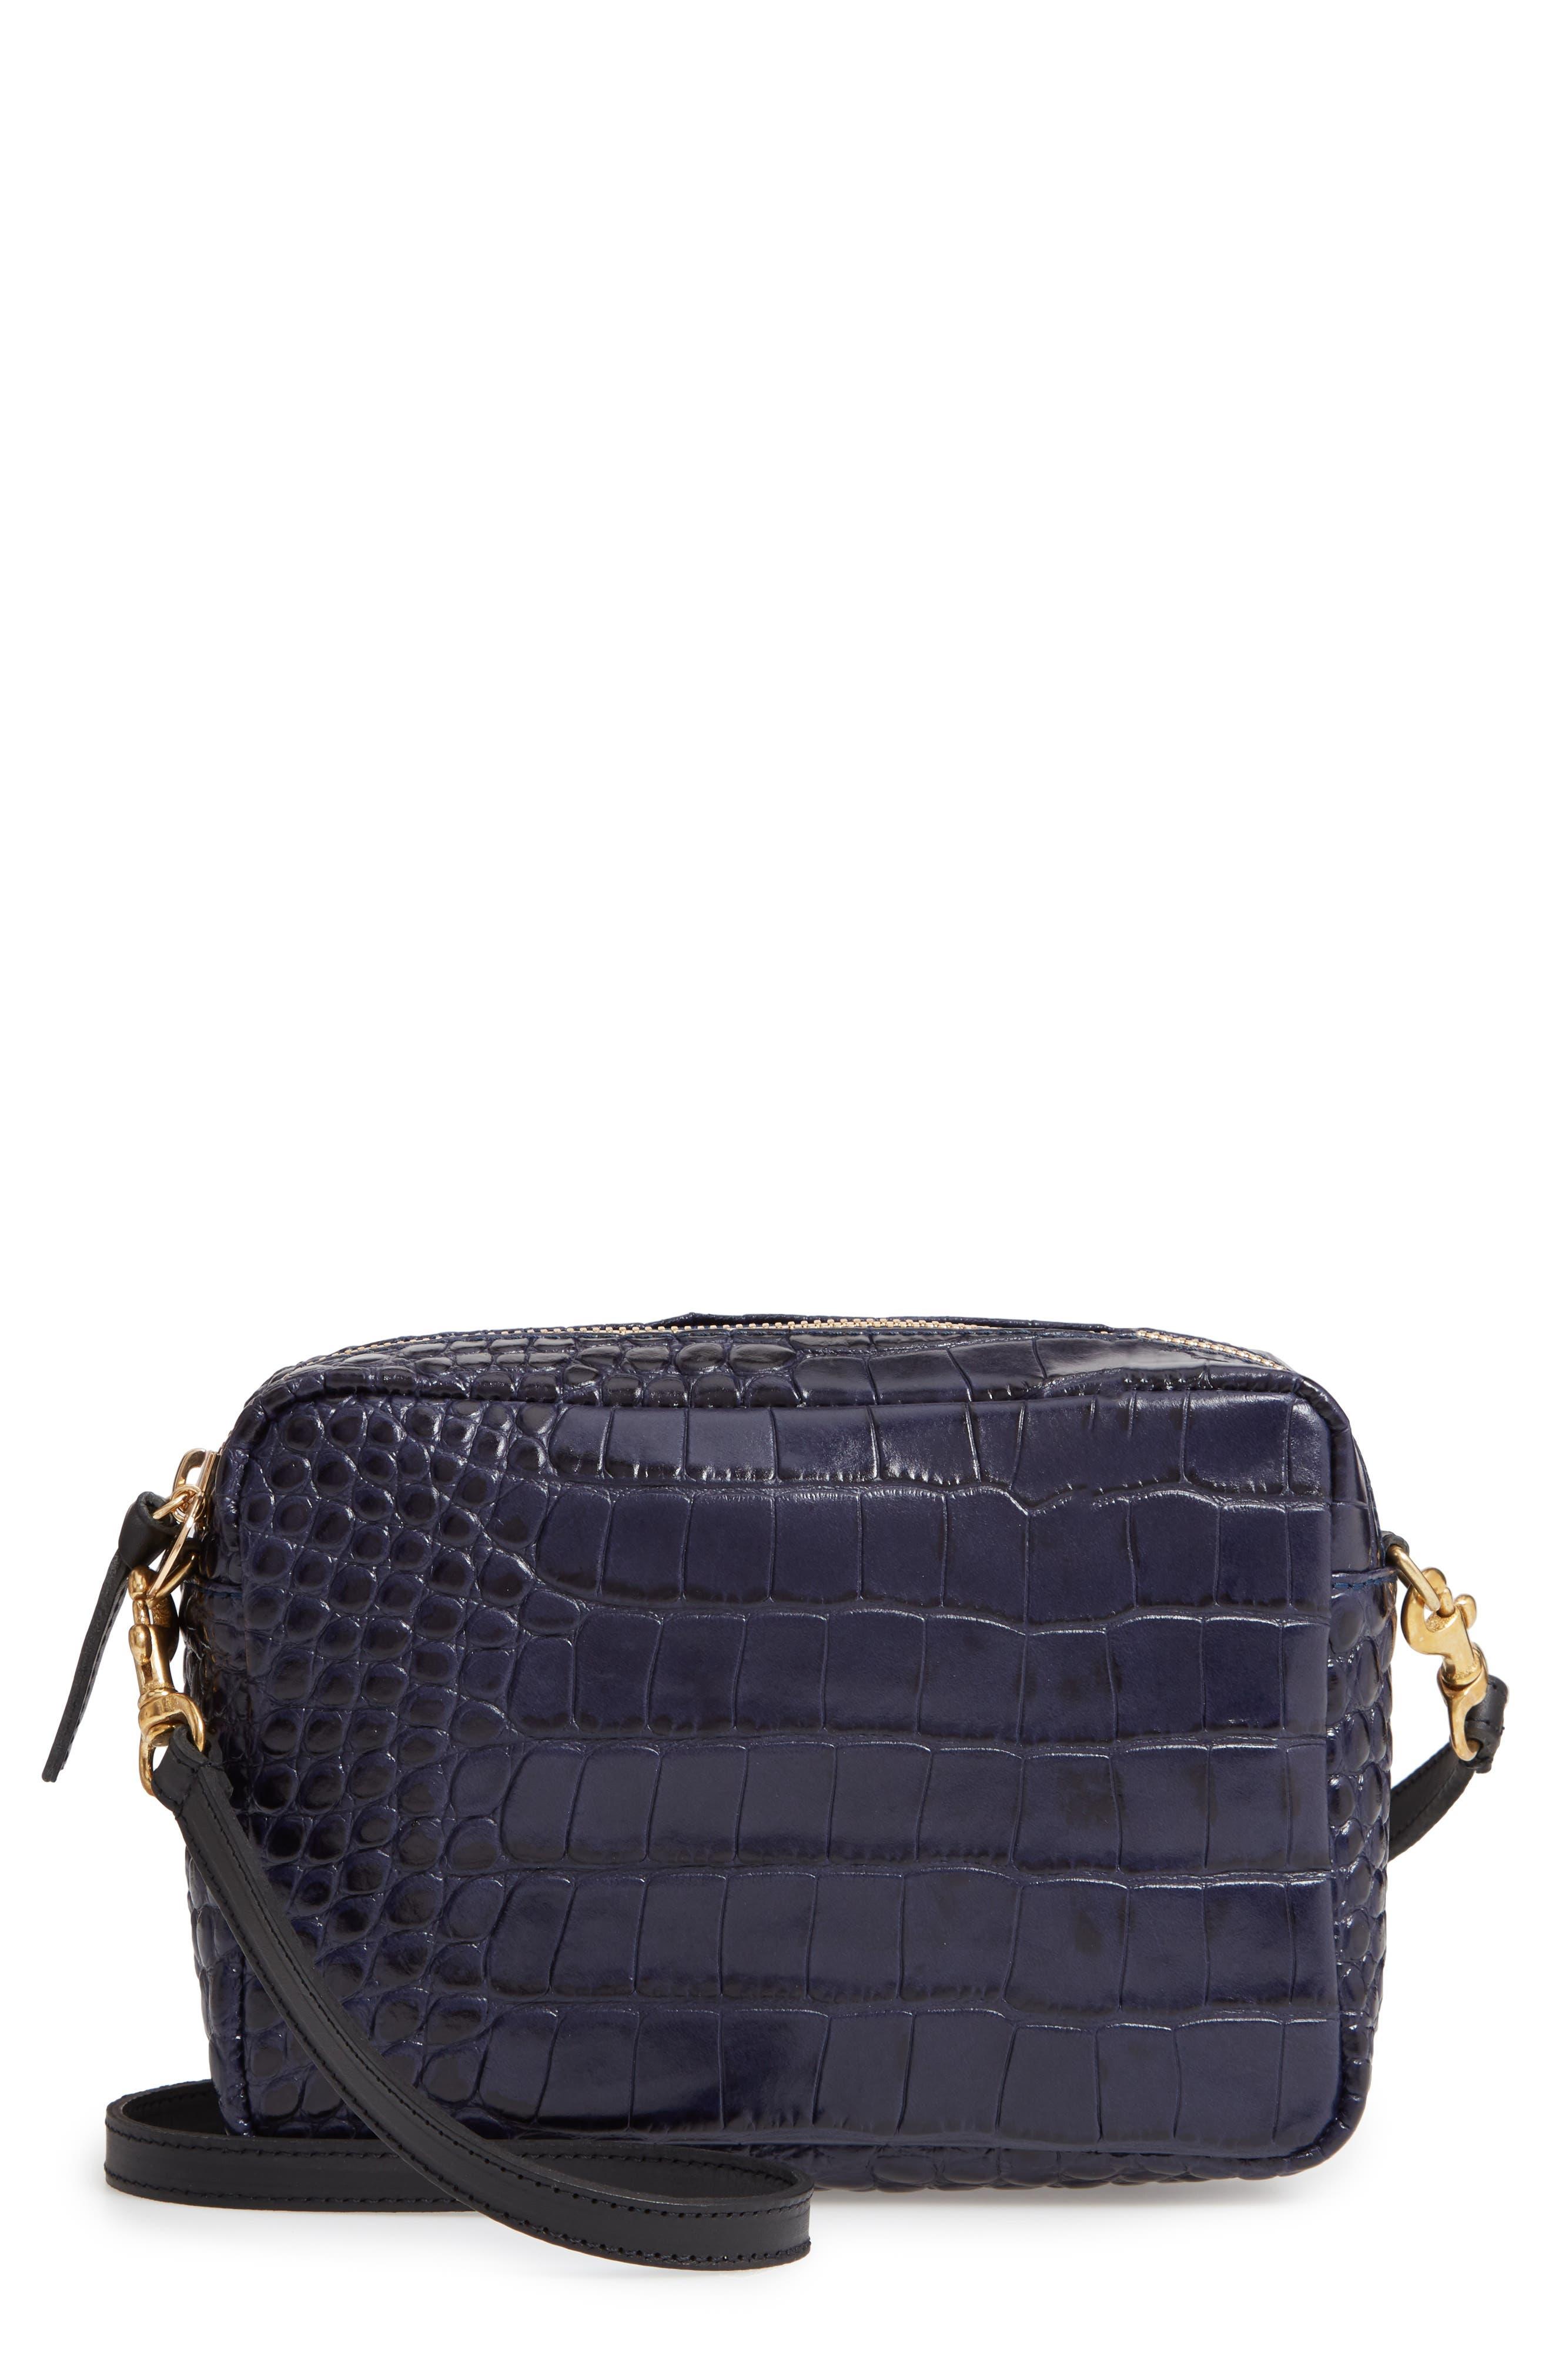 Midi Sac Croc Embossed Leather Crossbody Bag,                         Main,                         color, MIDNIGHT CROCO